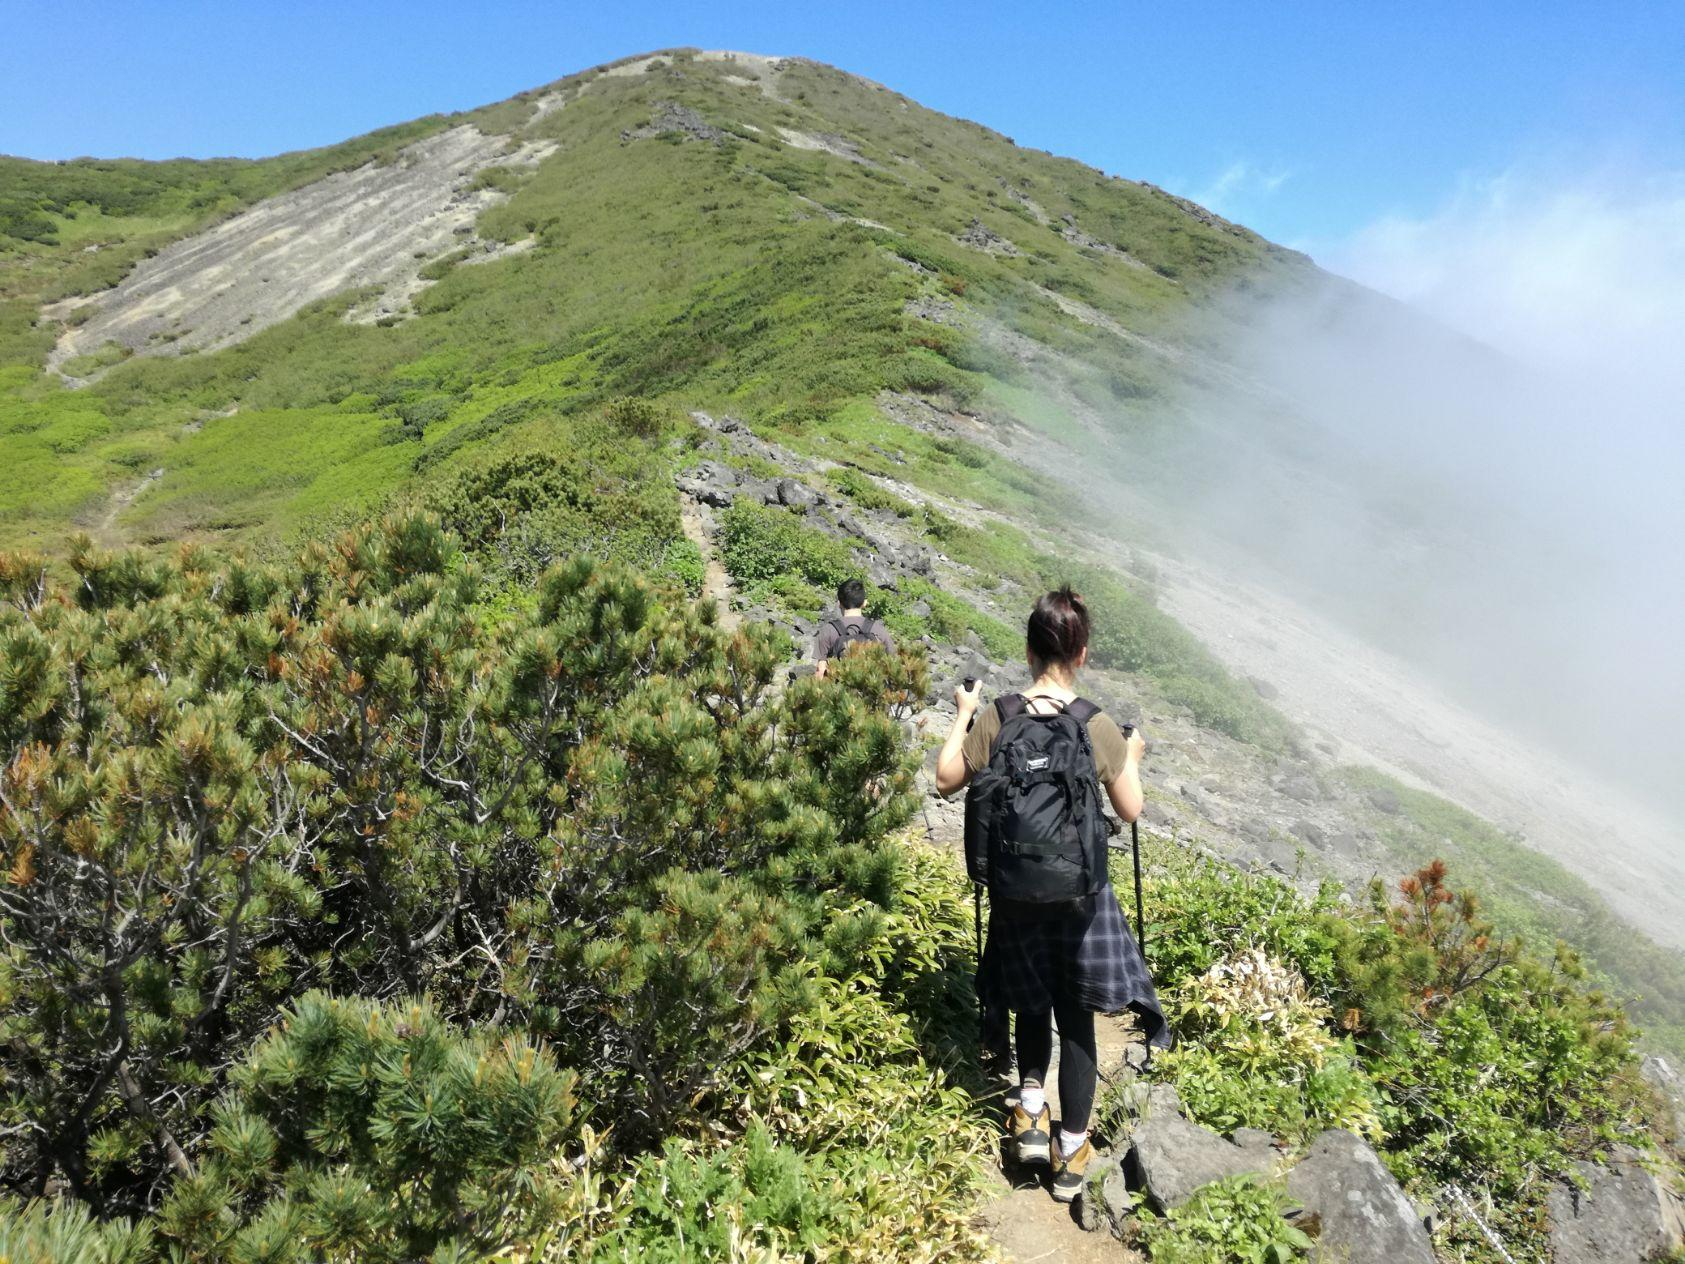 A view of a man hiking near Chatrium Niseko Japan